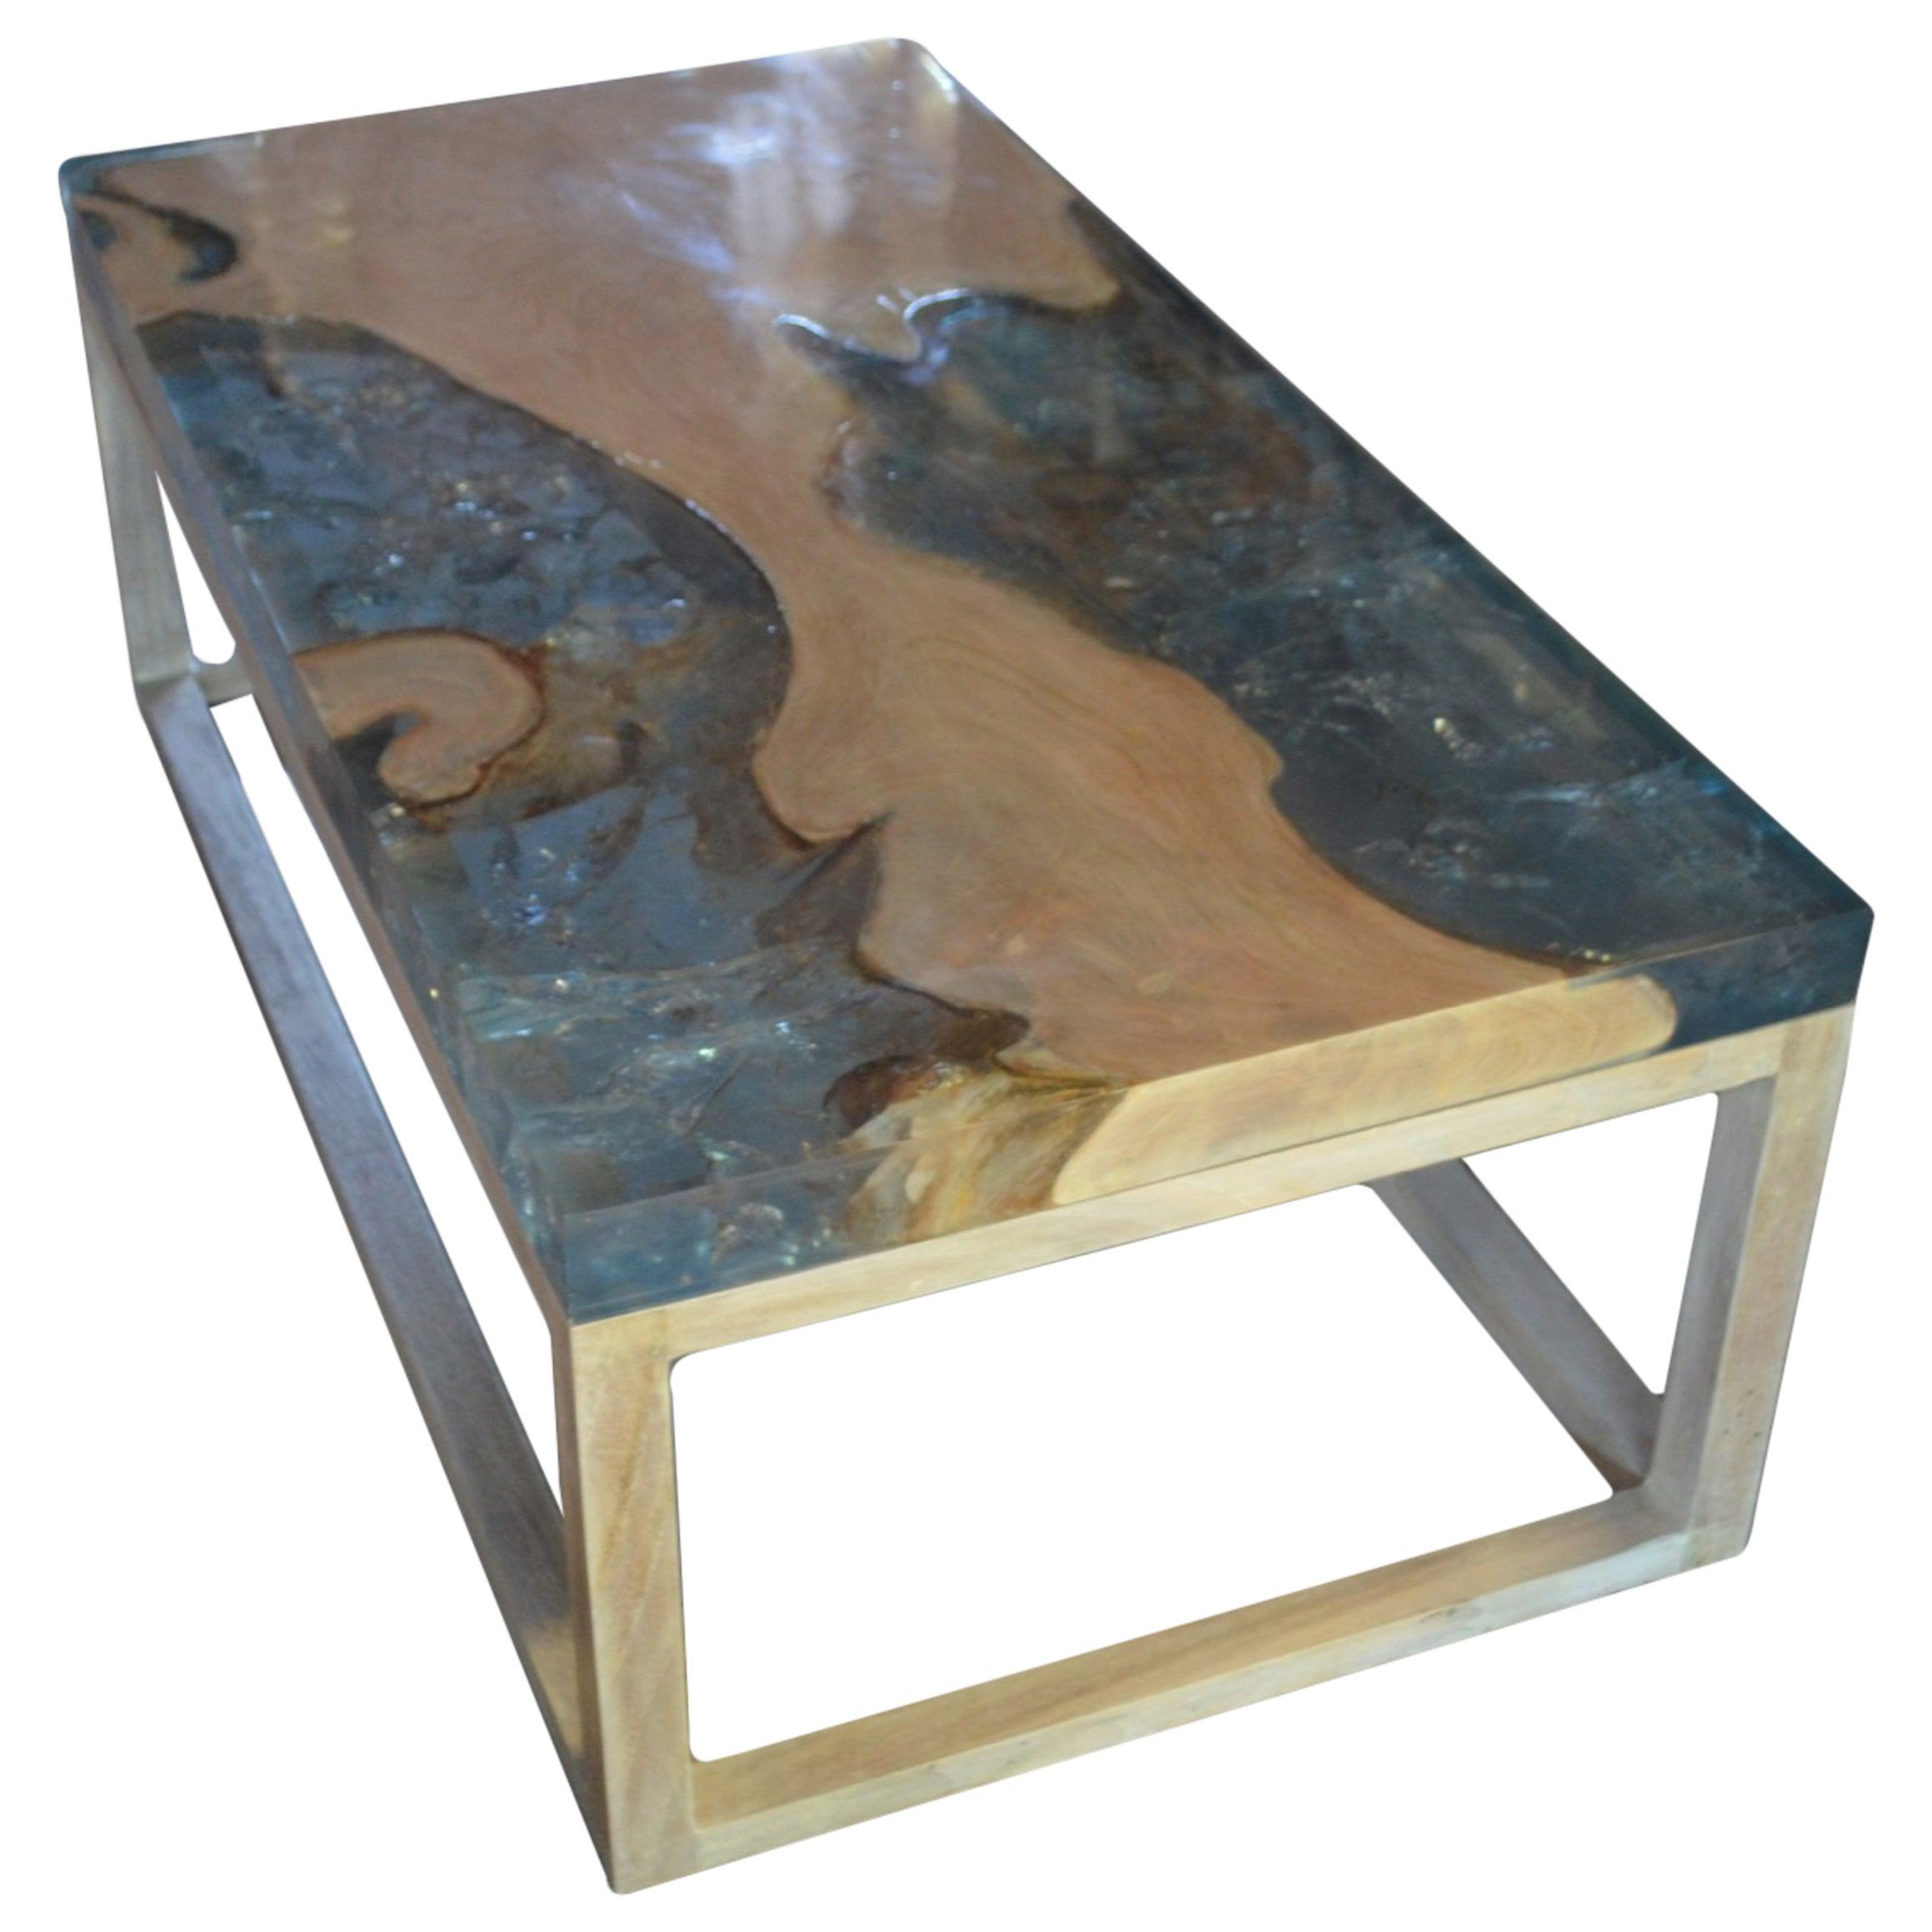 Andrianna Shamaris St. Barts Teak Wood Coffee Table with Resin